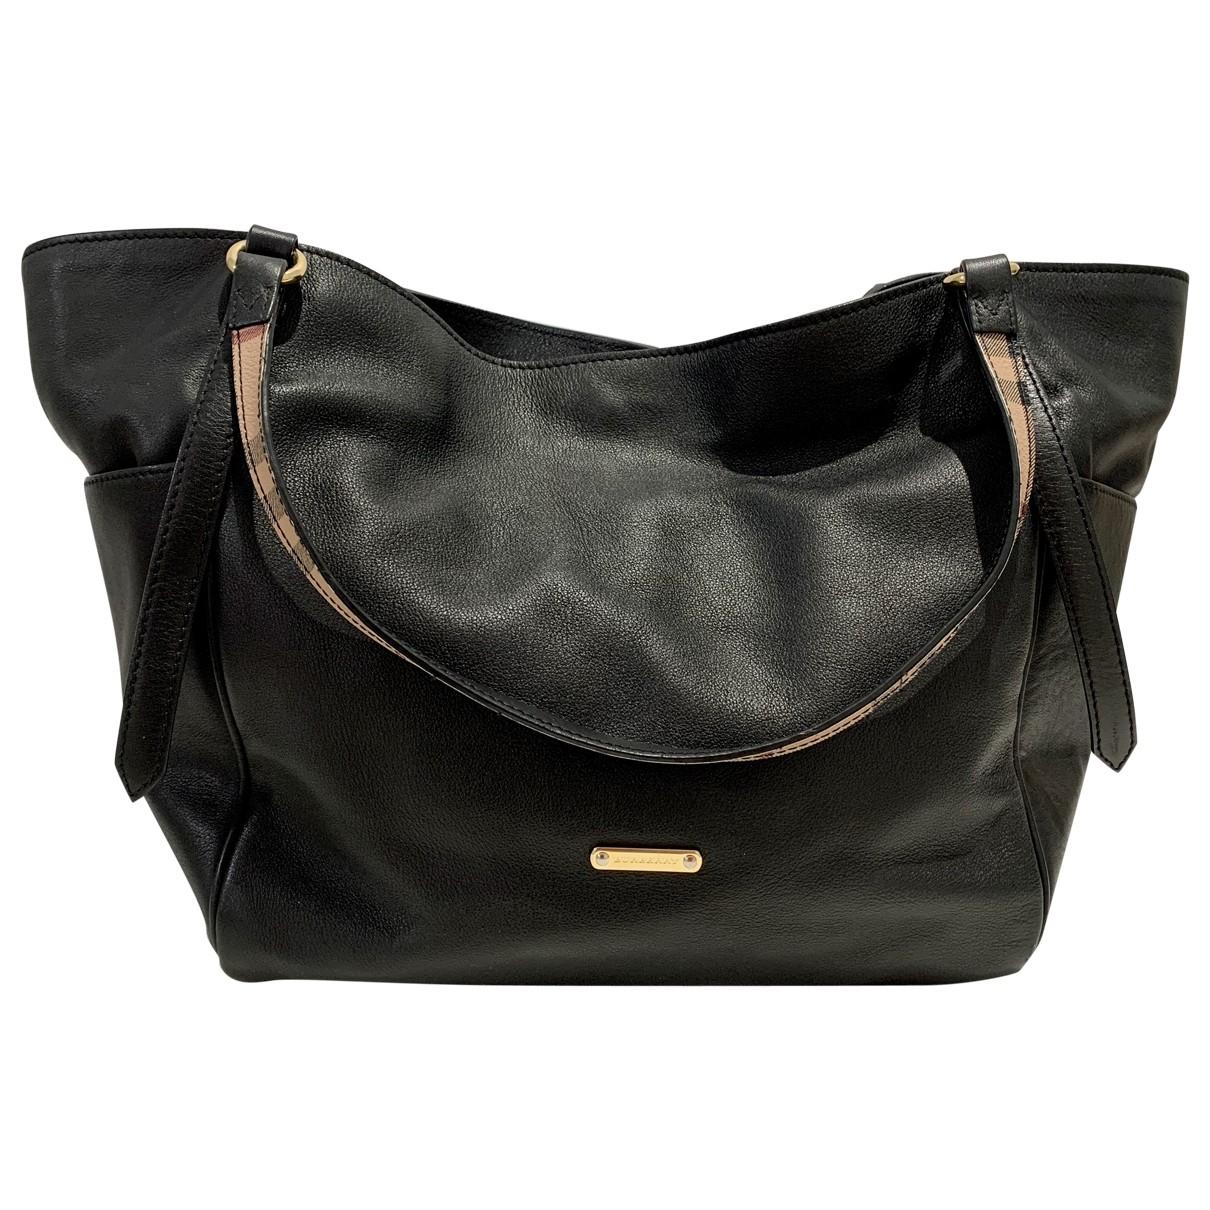 Burberry \N Black Leather handbag for Women \N